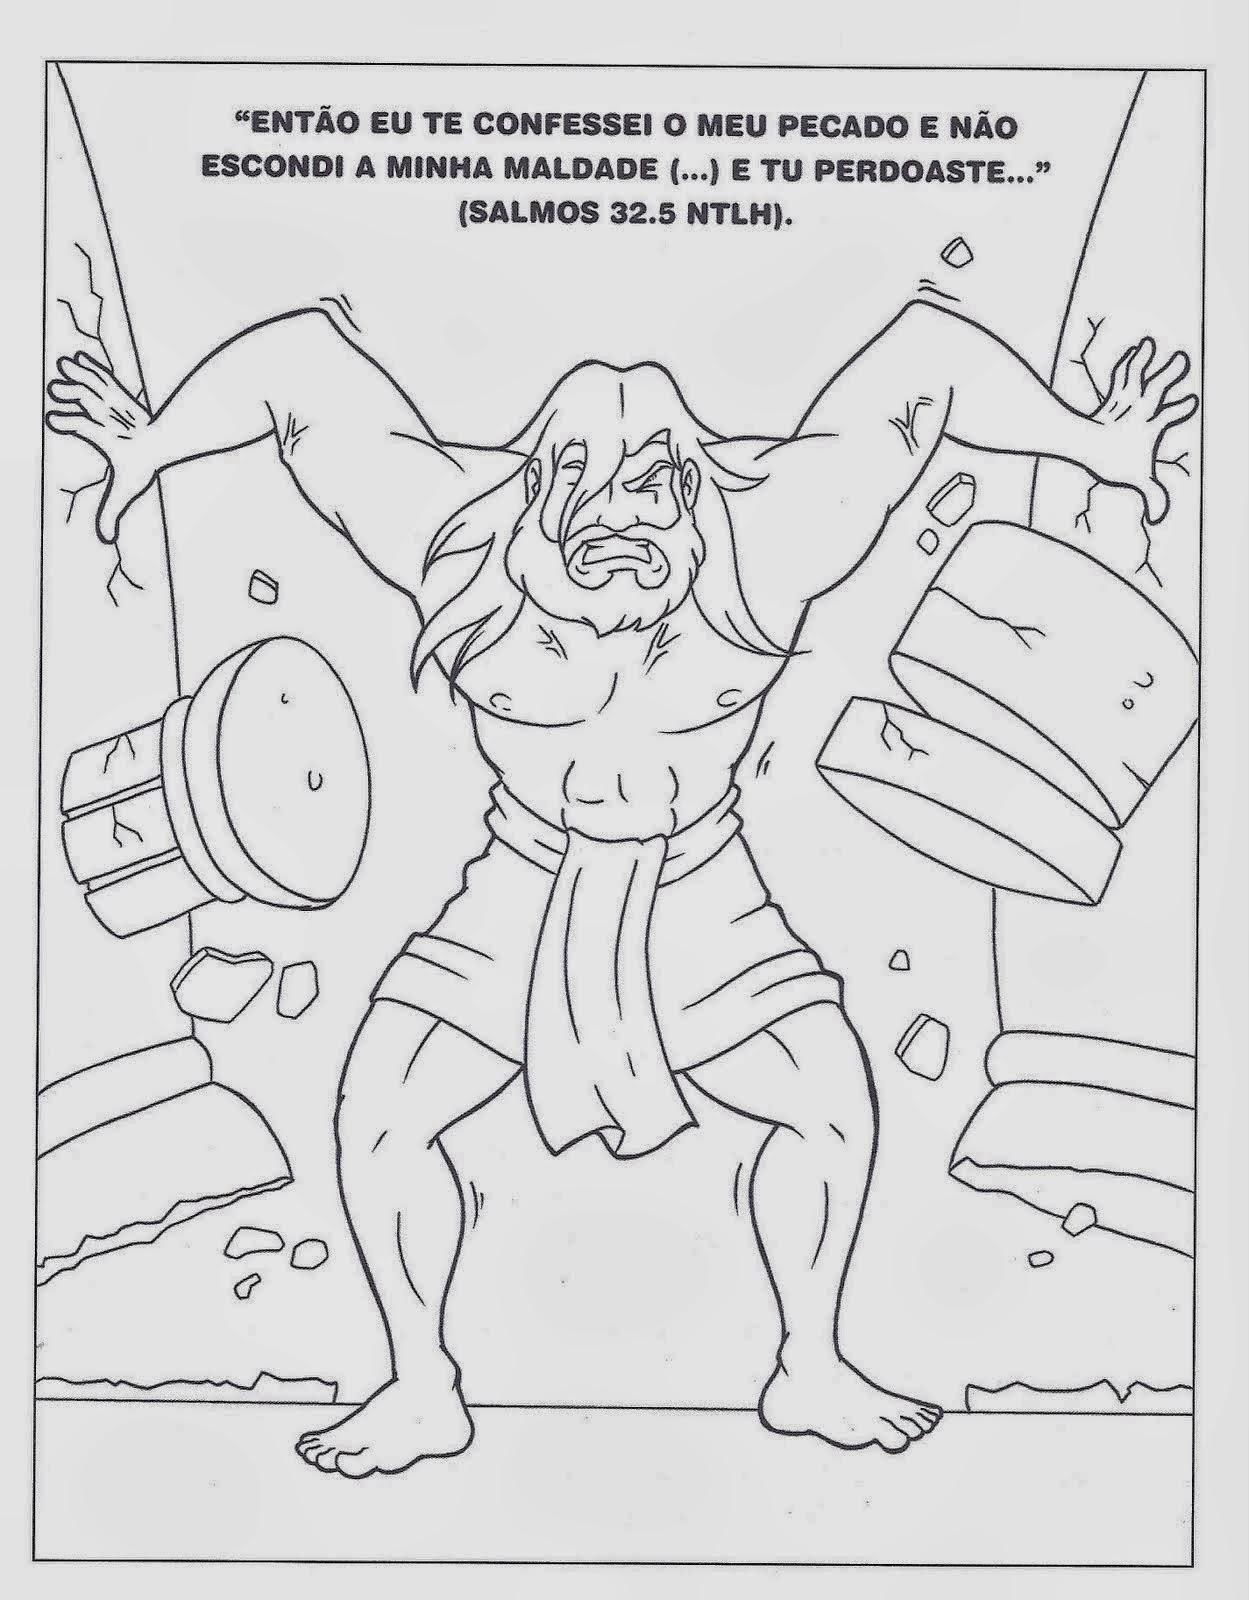 And Knot Viking Work Viking Hamme Work Black Hammer Thor Knot Black And White White Thor